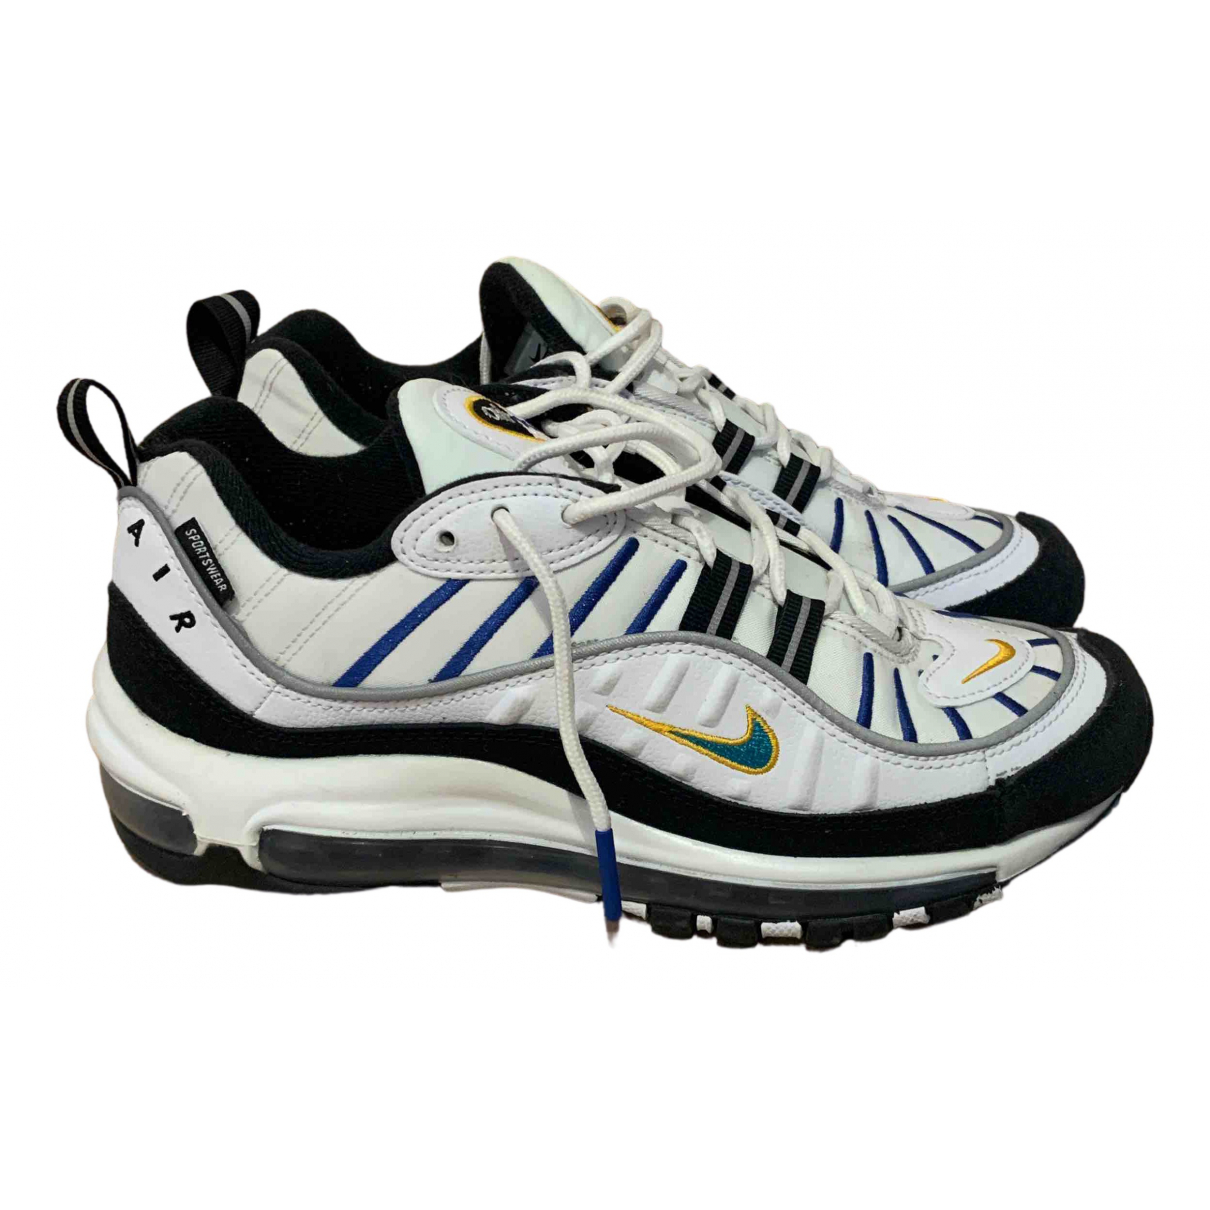 Nike - Baskets Air Max 98 pour femme en toile - blanc